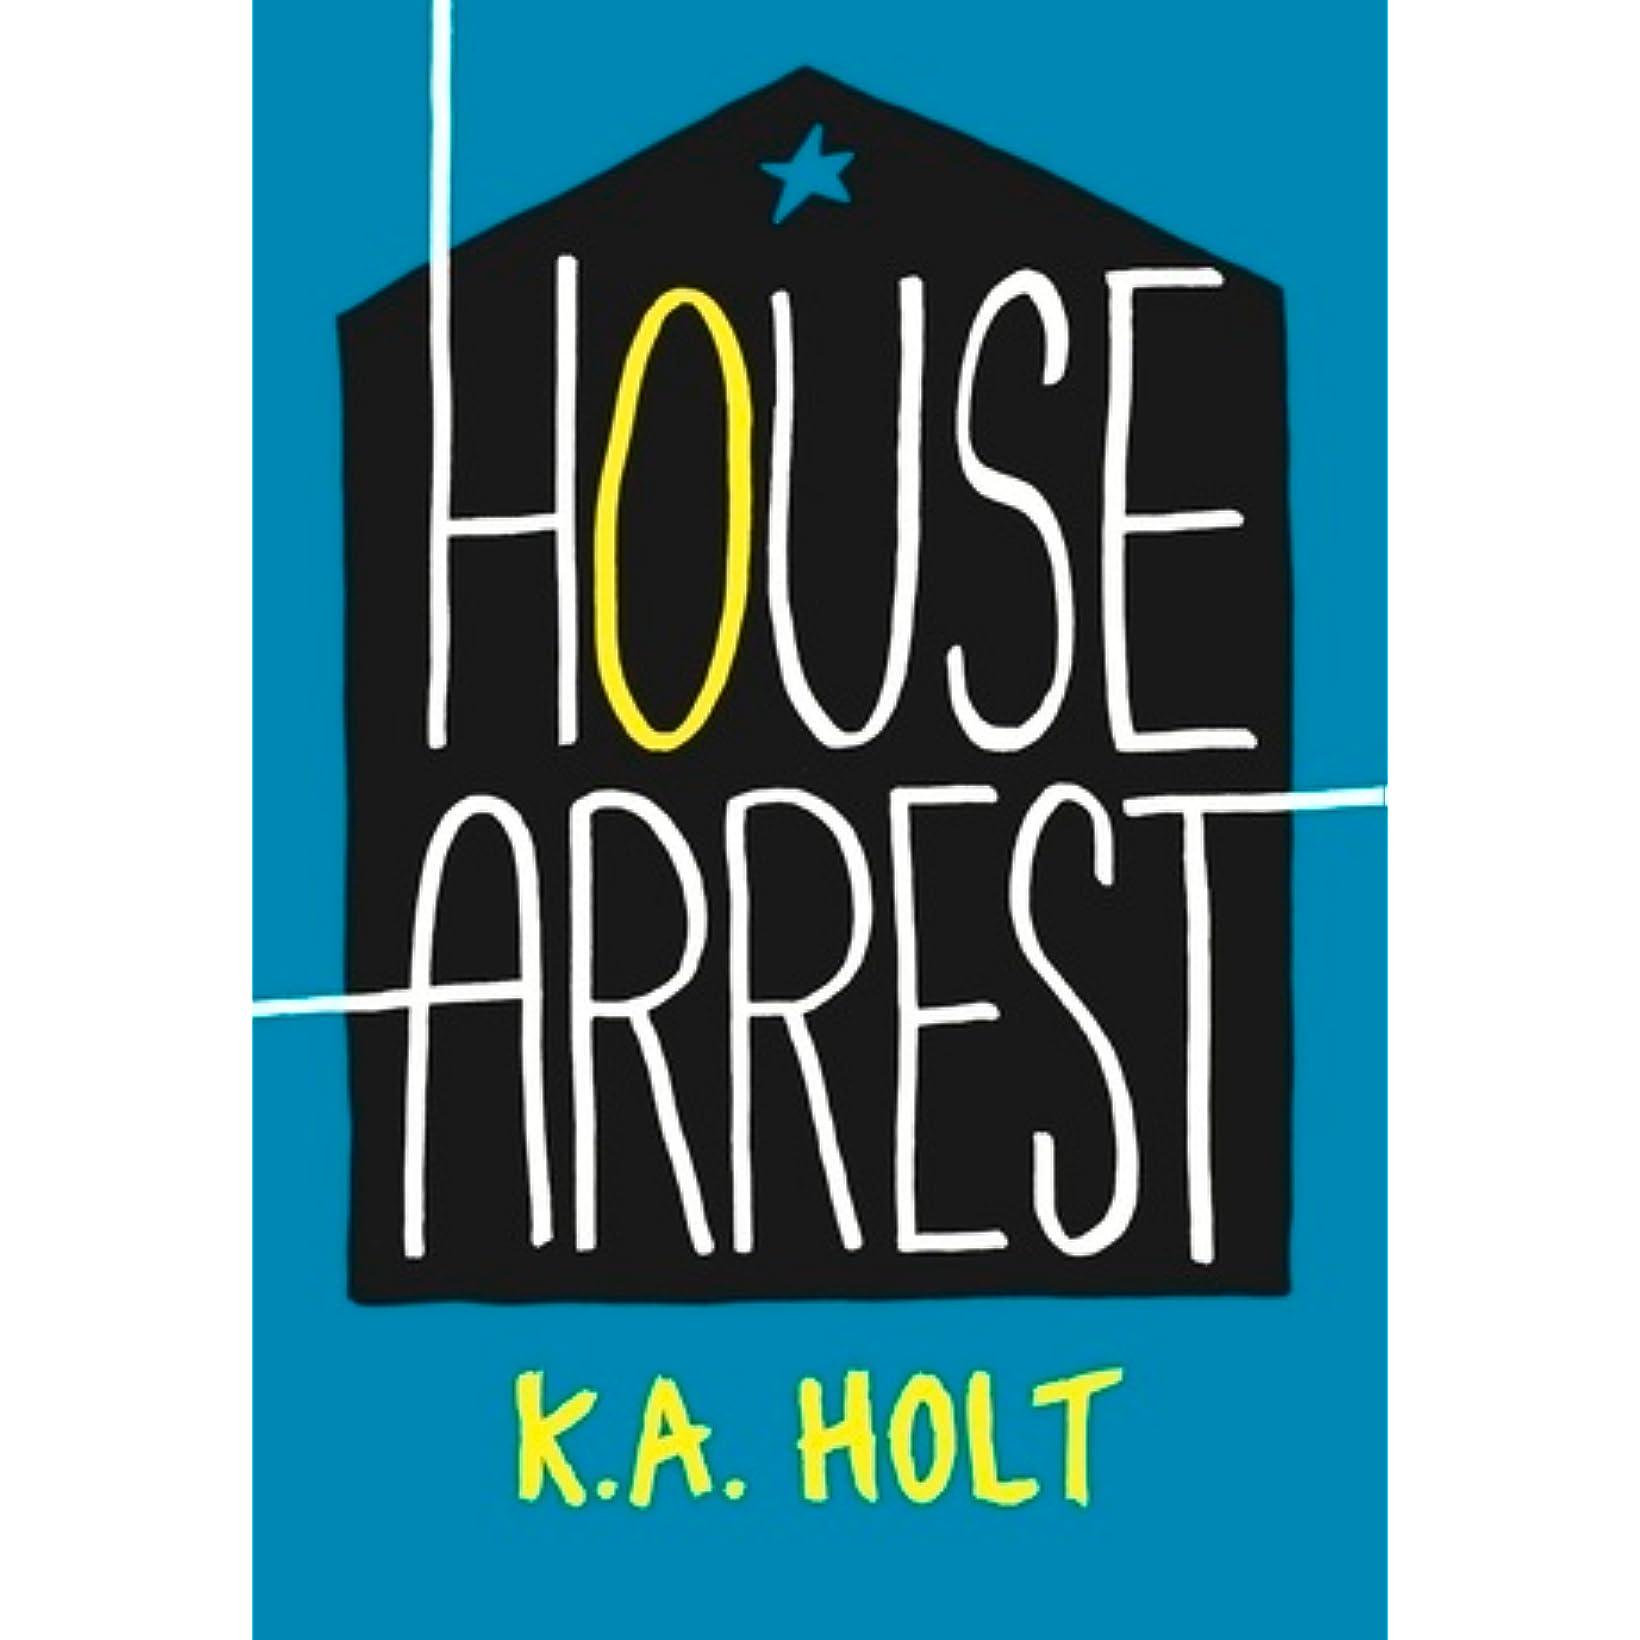 House Arrest by KA Holt